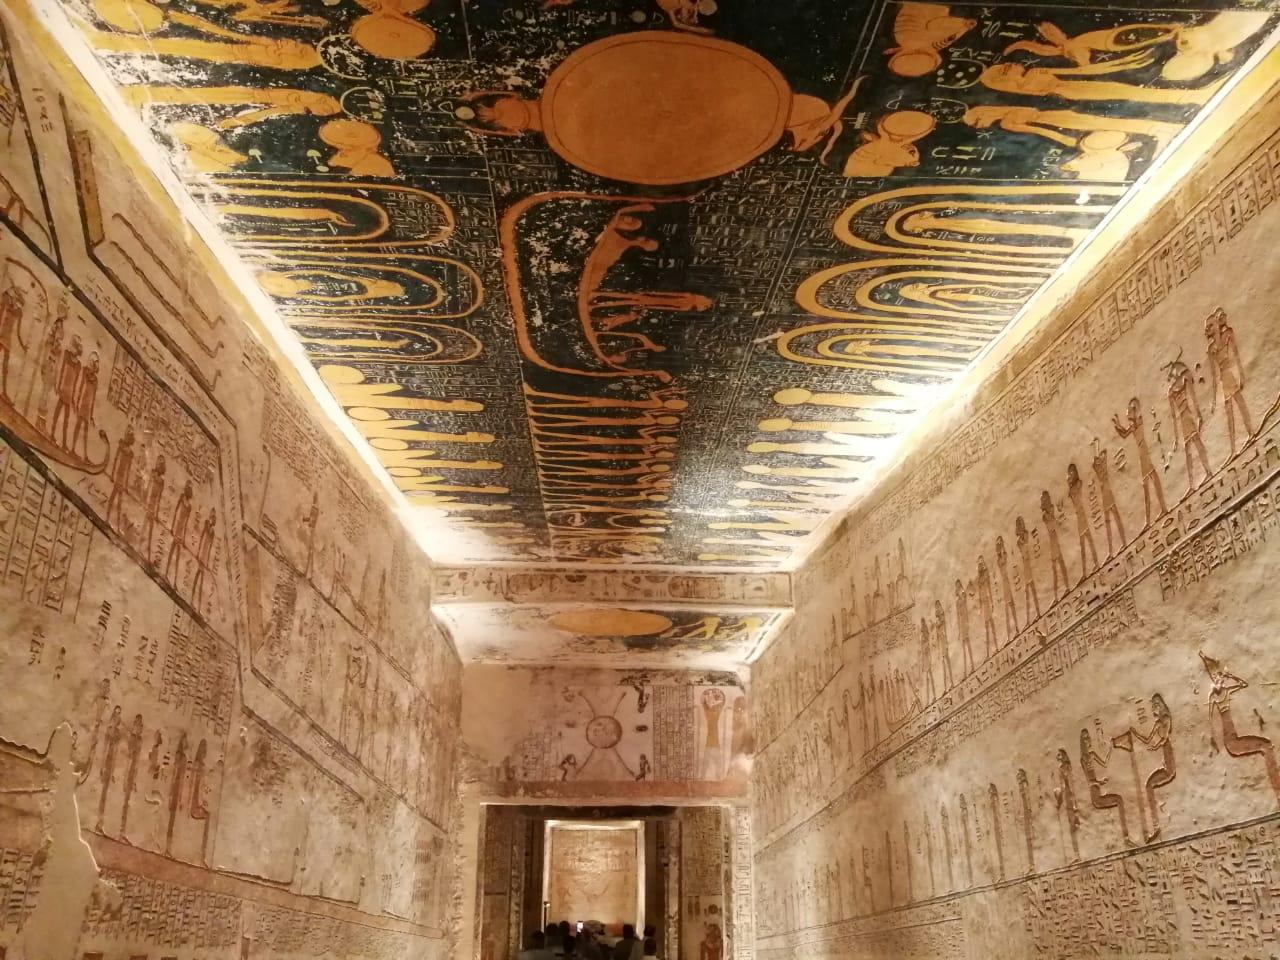 Ramesses VI main tomb chamber